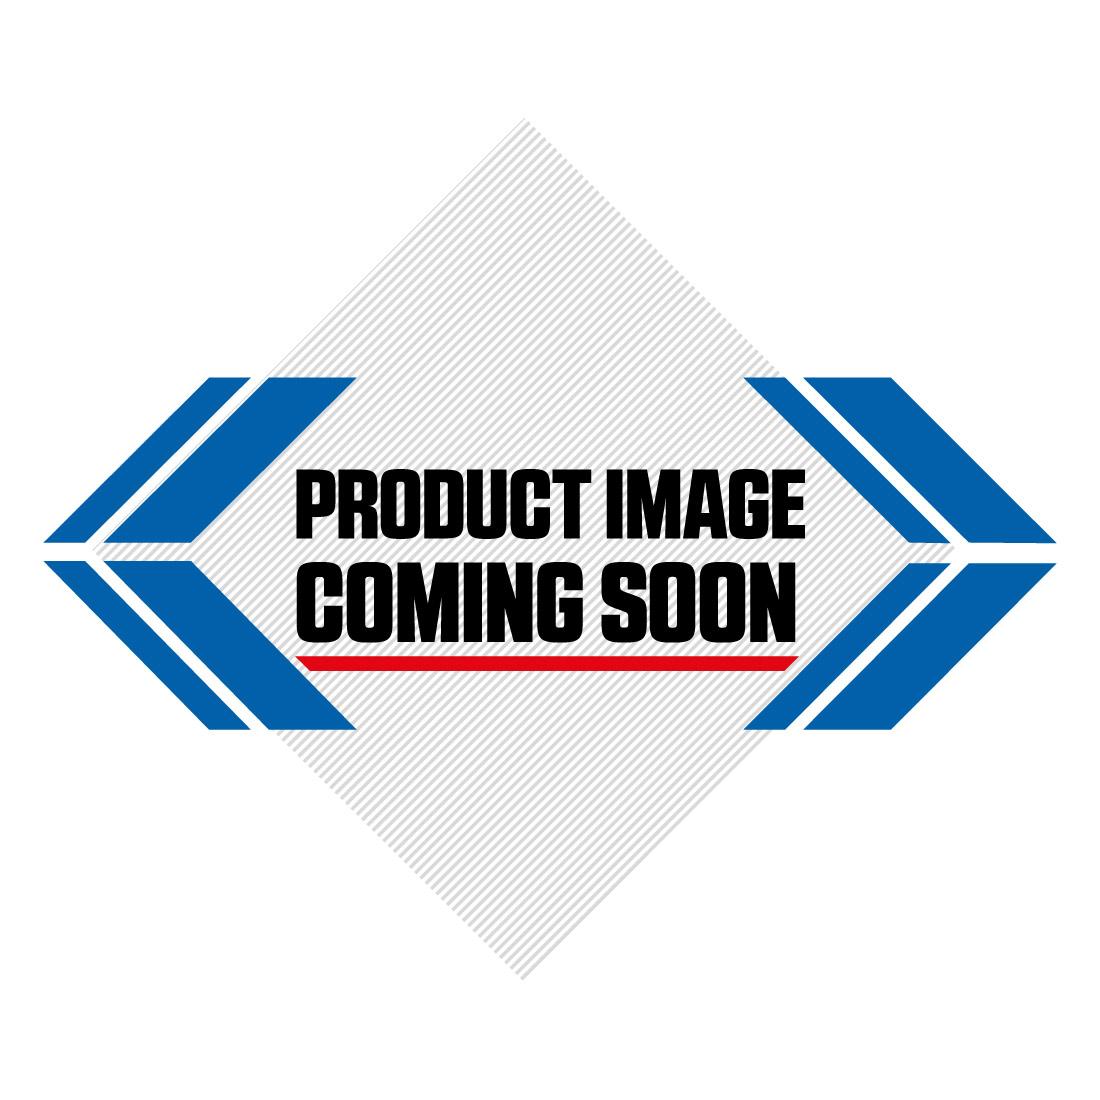 DJI Mavic Pro Fly More Combo 4K Quadcopter Drone Image-1